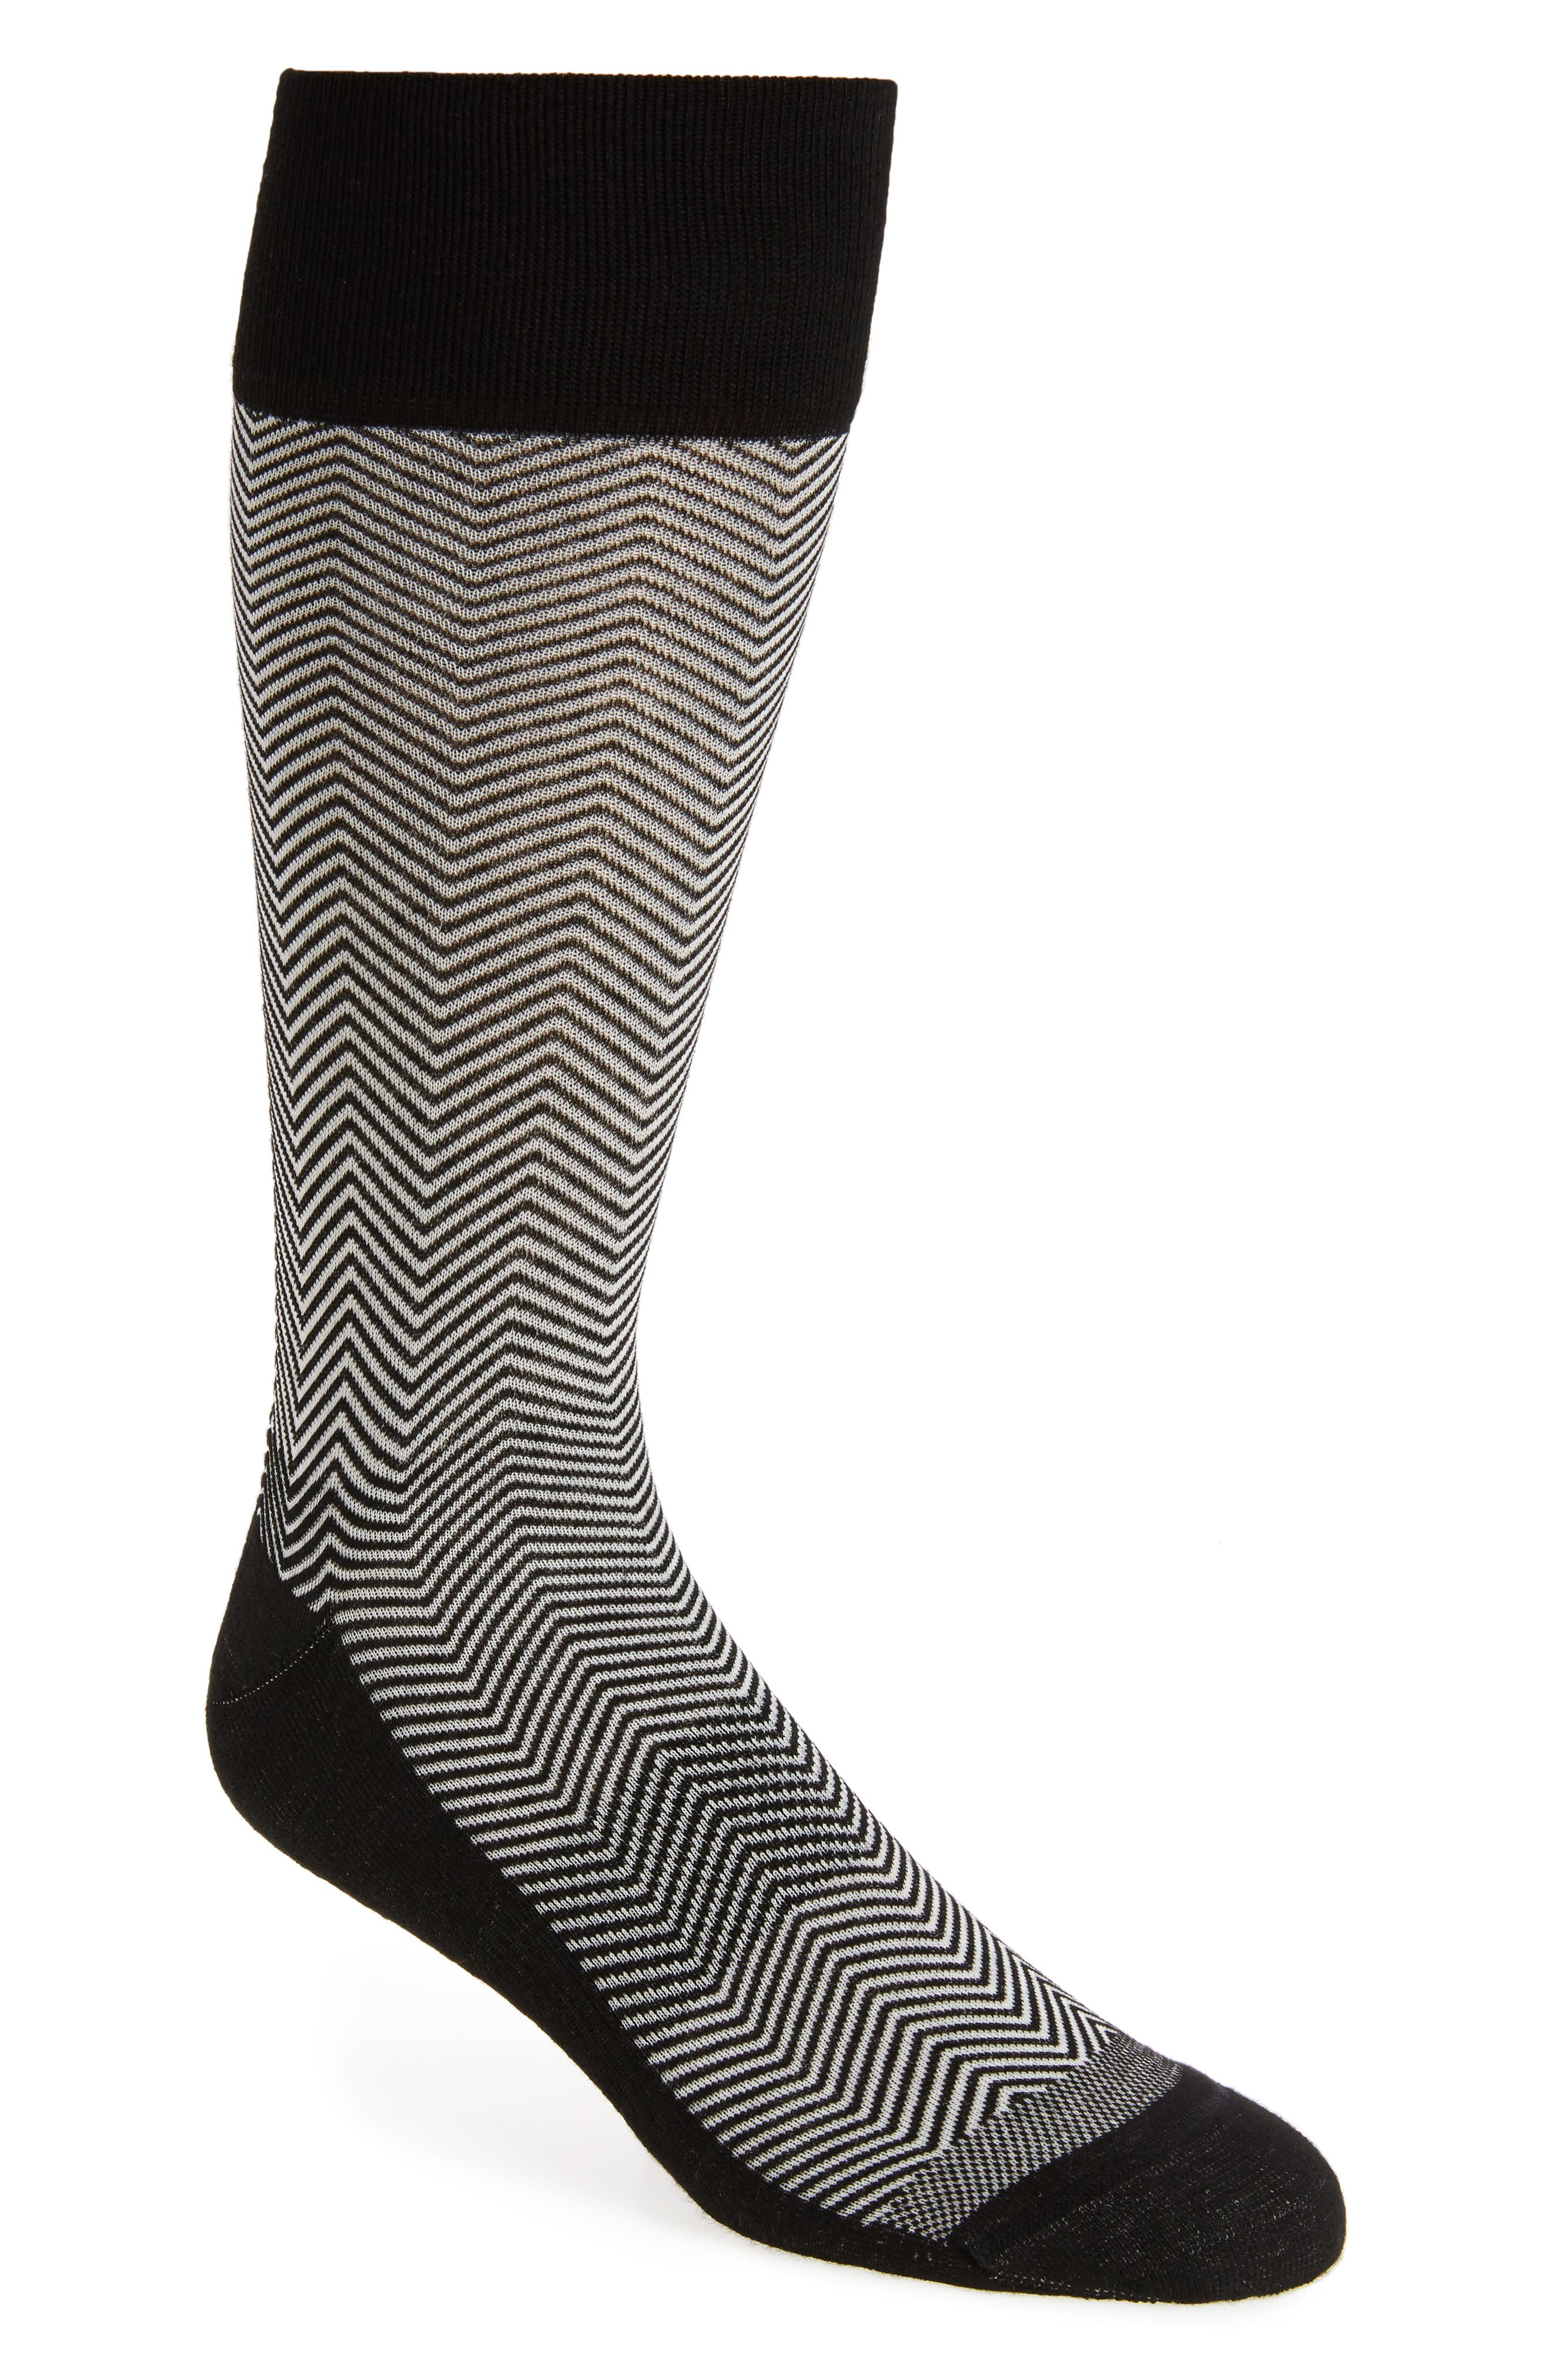 Chevron Socks,                         Main,                         color, 001